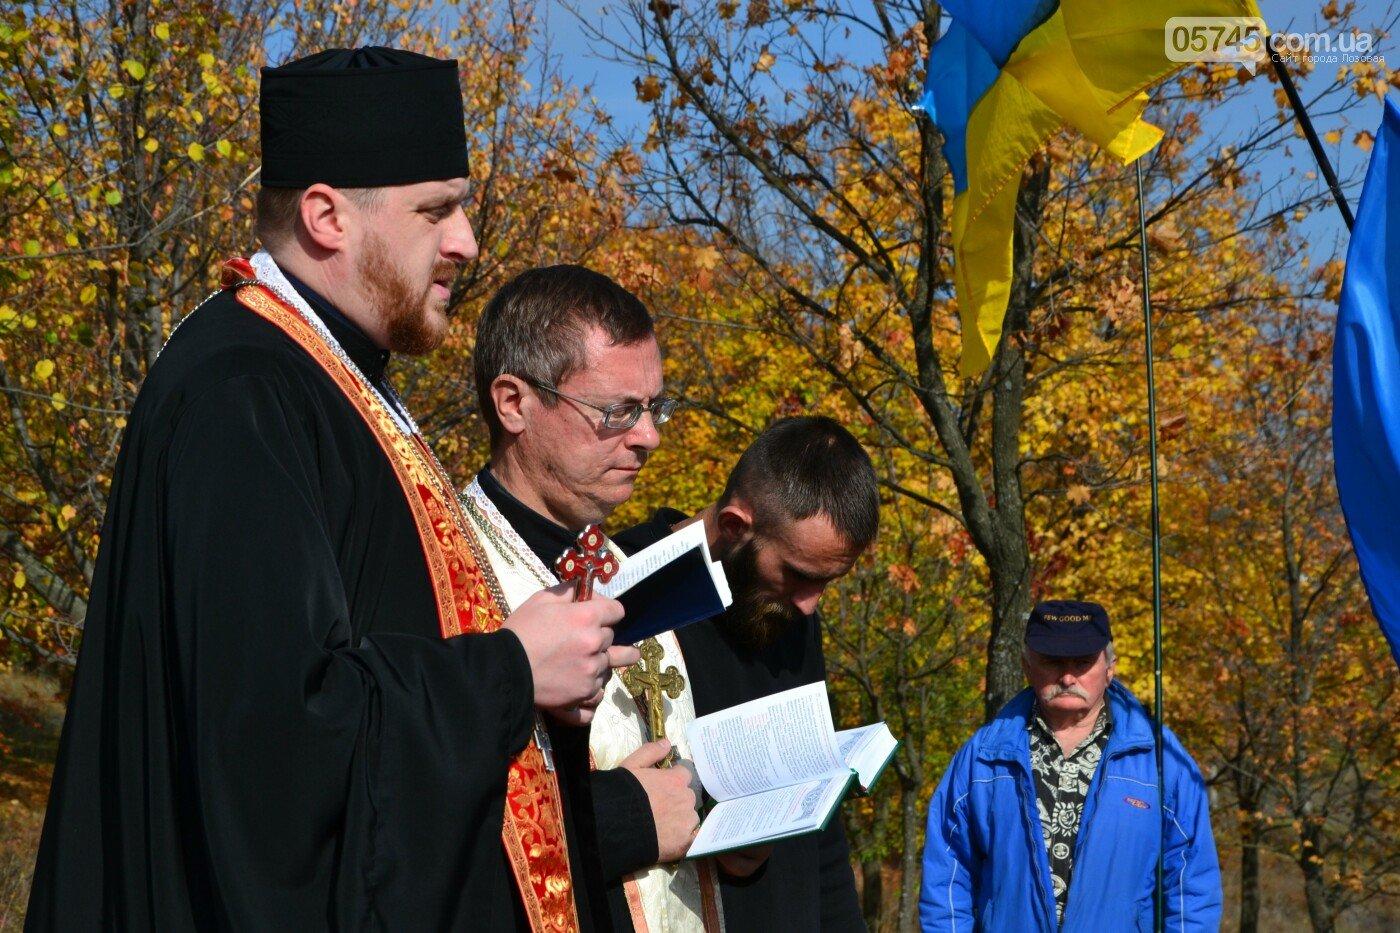 Без масок и карантина: как Лозовщина праздновала День защитника Украины год назад (ФОТО), фото-29